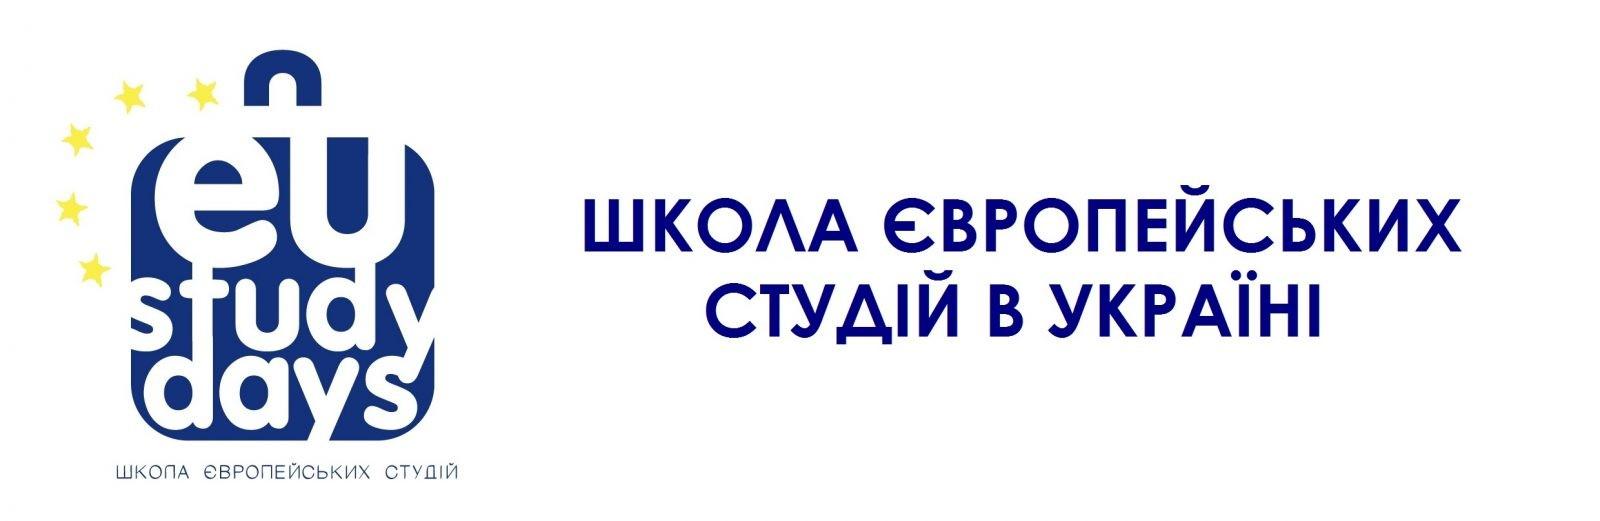 EU Study Days в Ужгороді